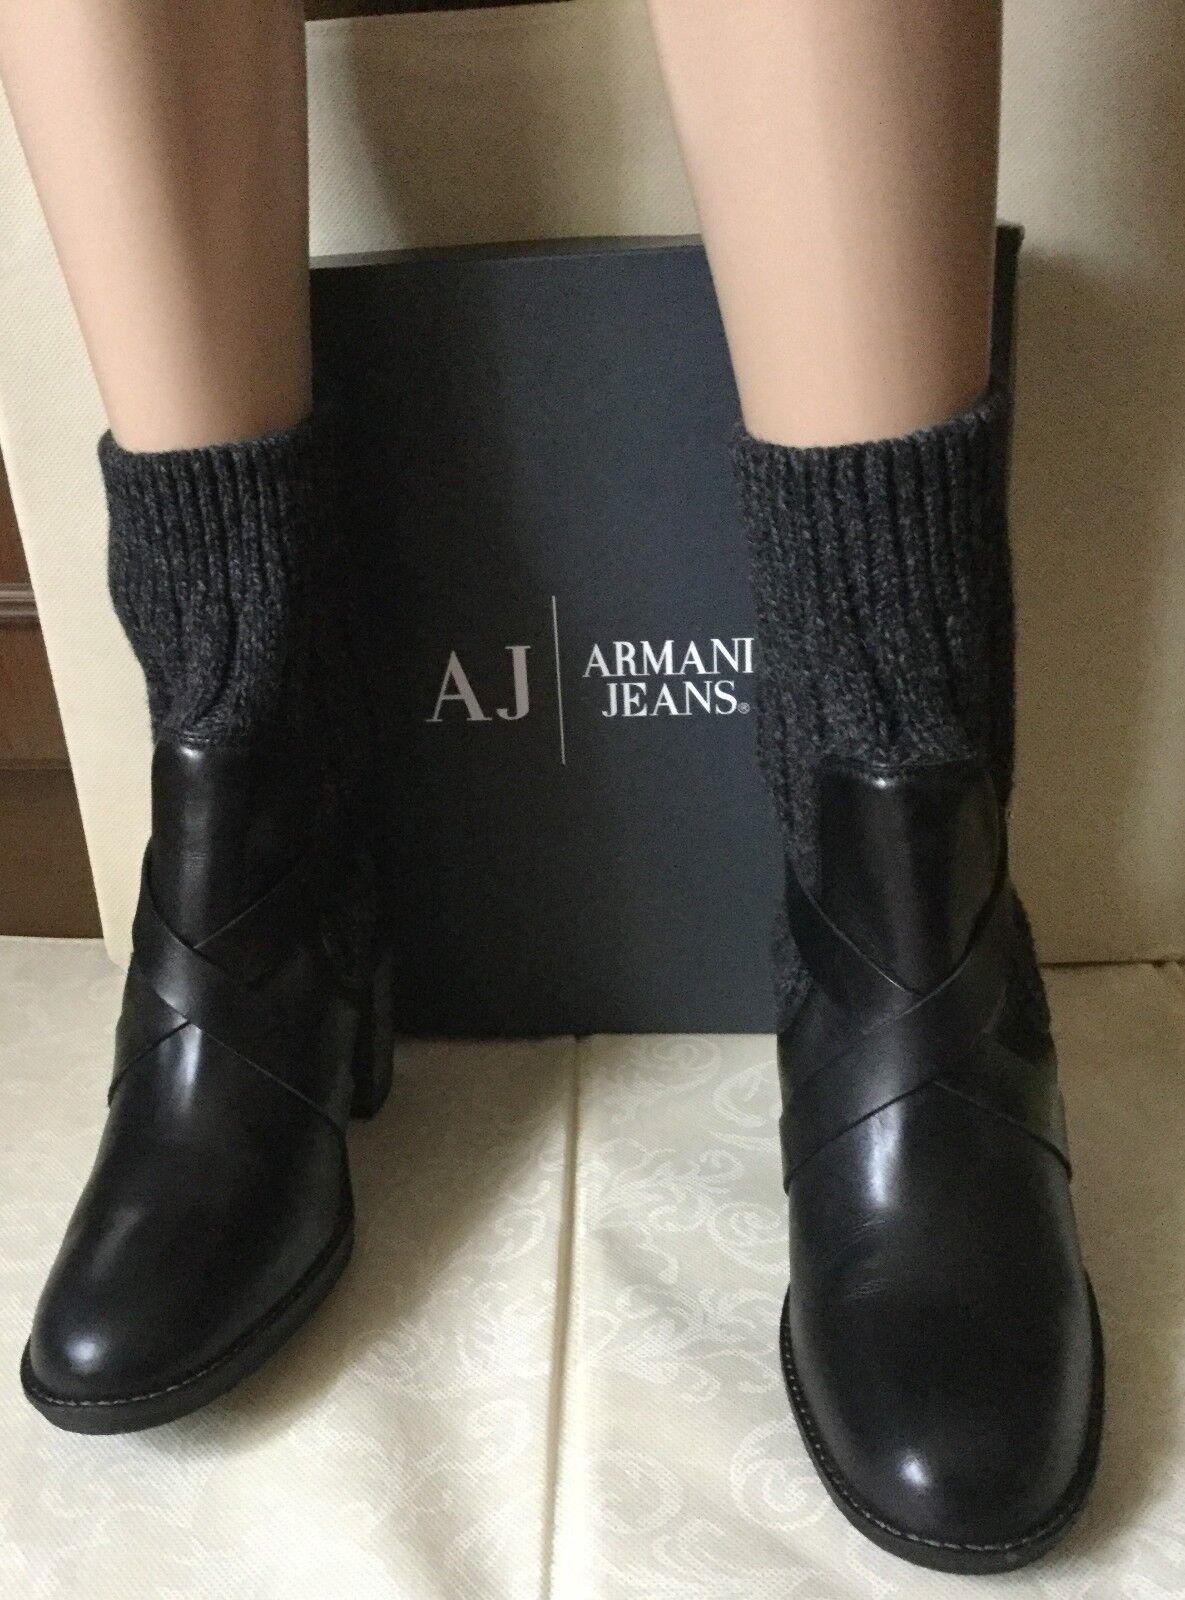 ARMANI JEANS Women's ankle boots, black color, size 41  Stivaletti women, black